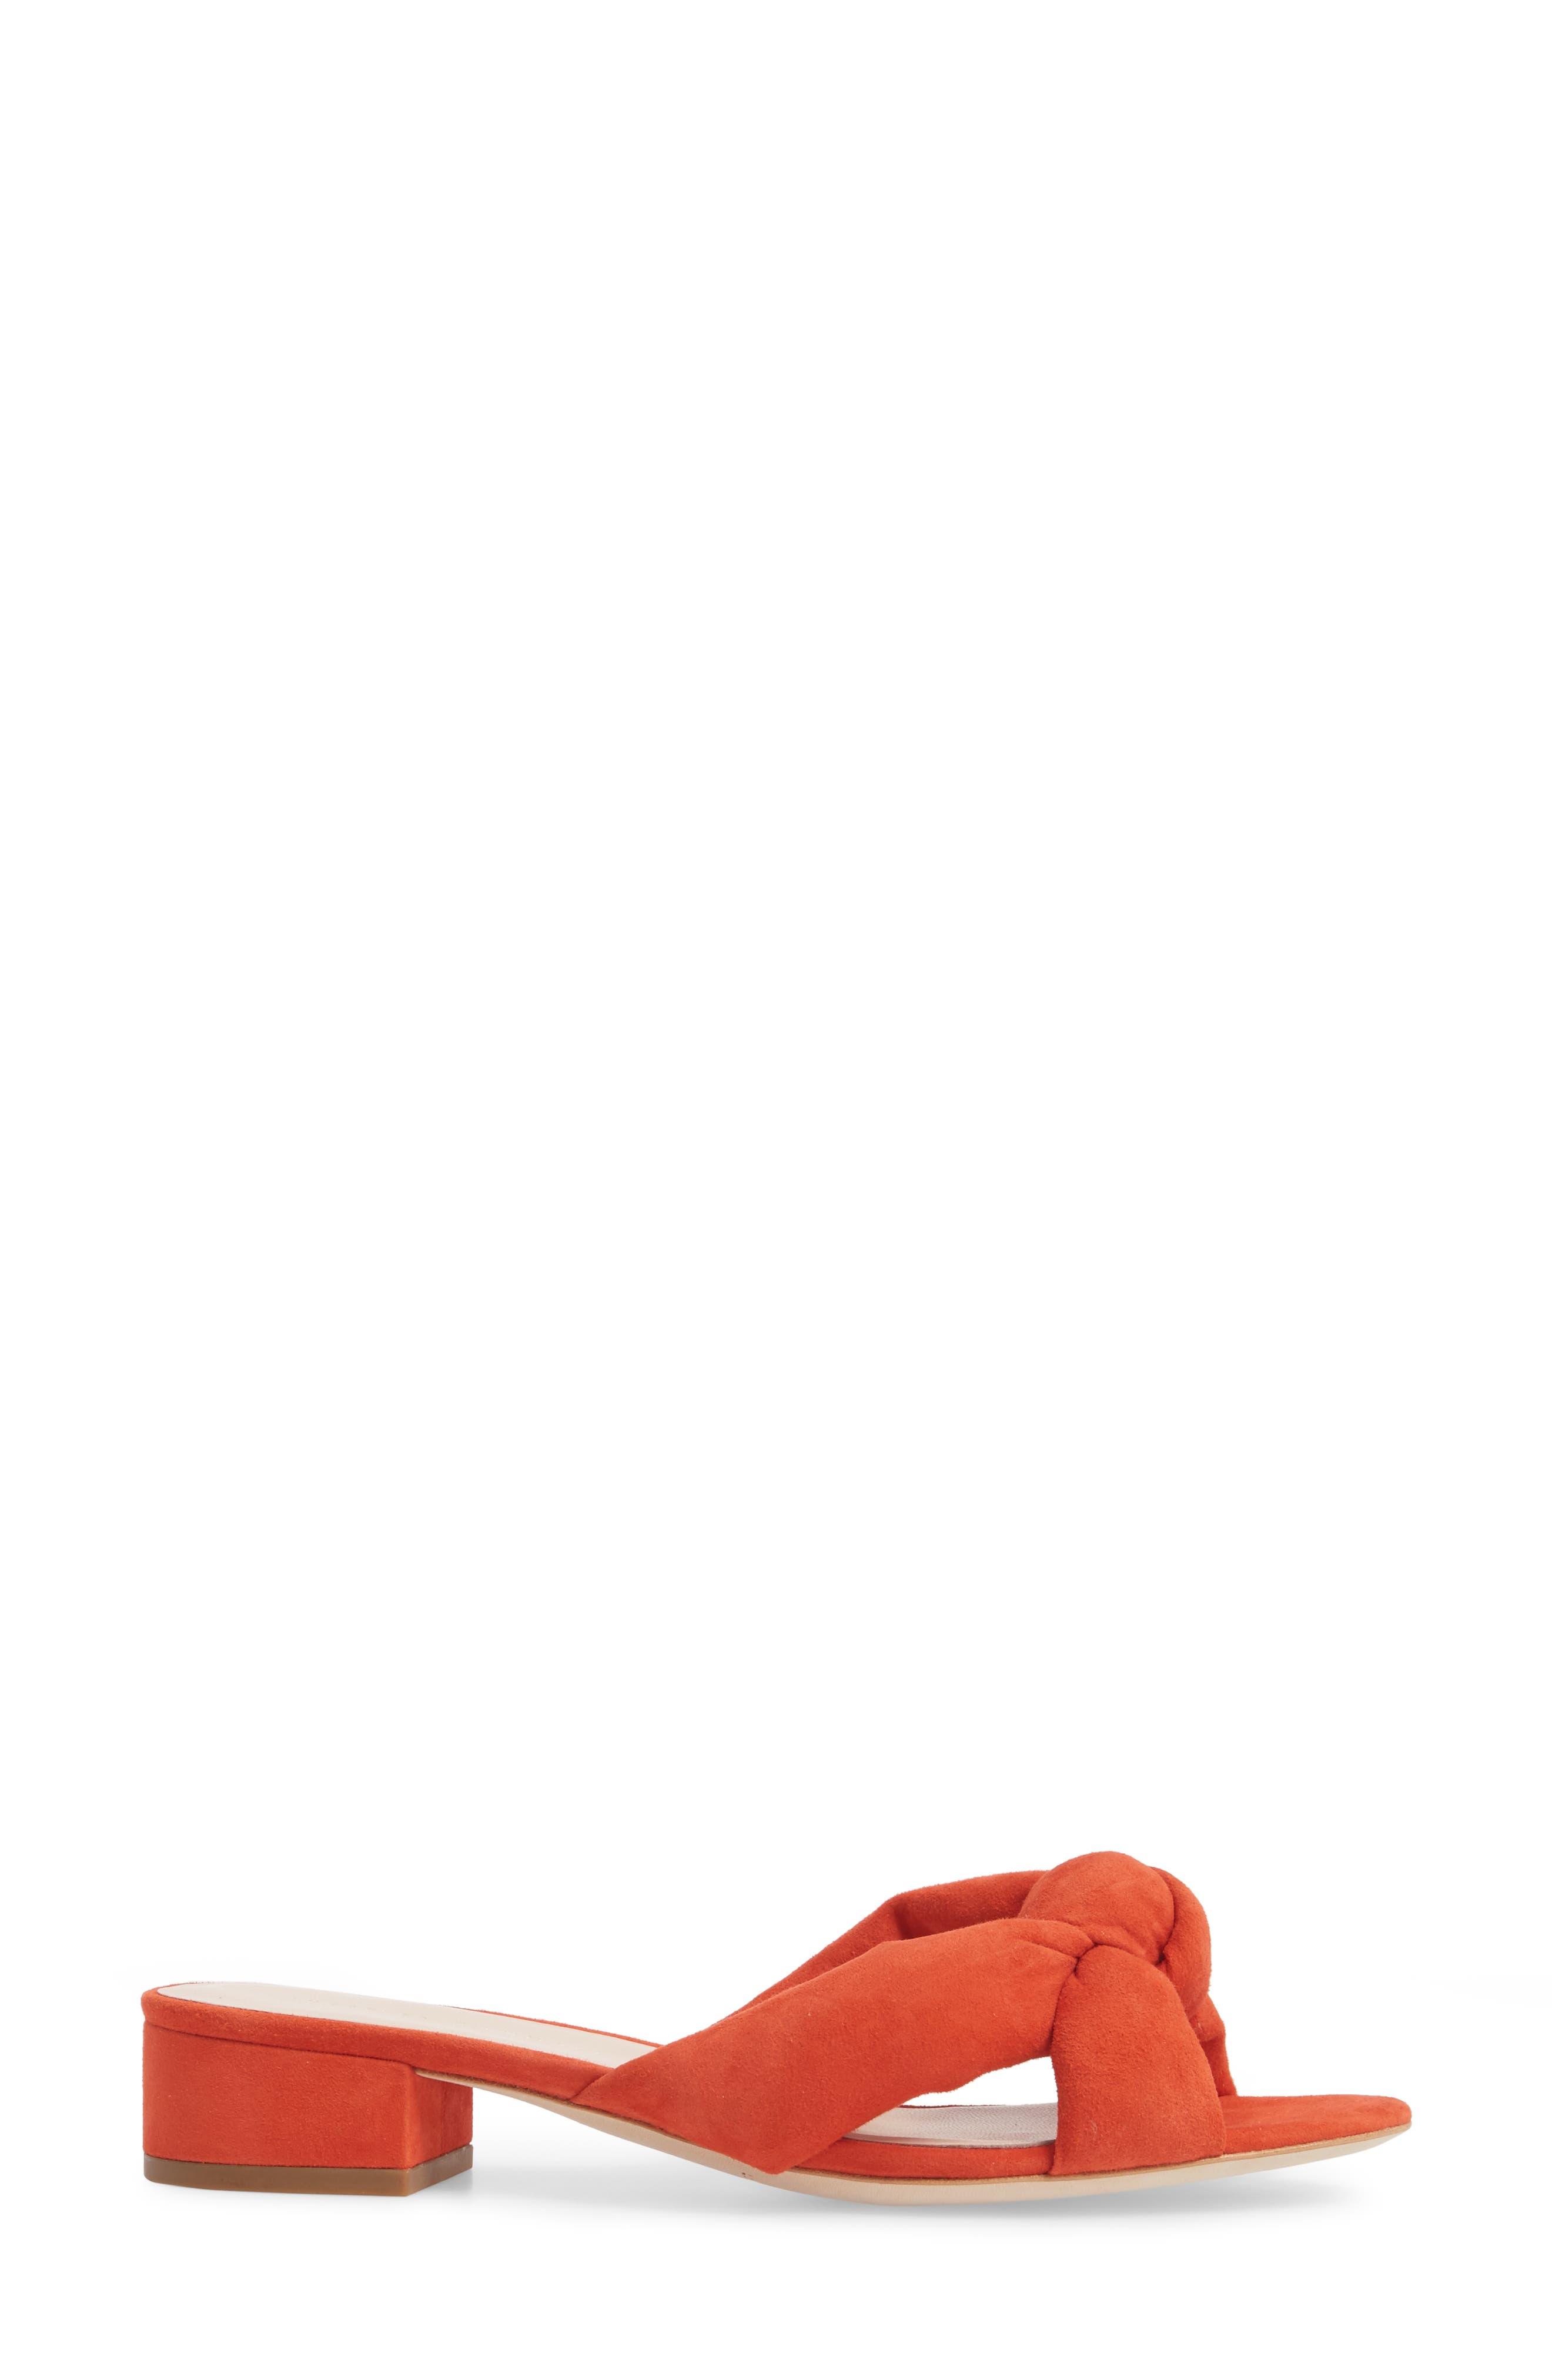 Elsie Knotted Slide Sandal,                             Alternate thumbnail 3, color,                             Persimmon